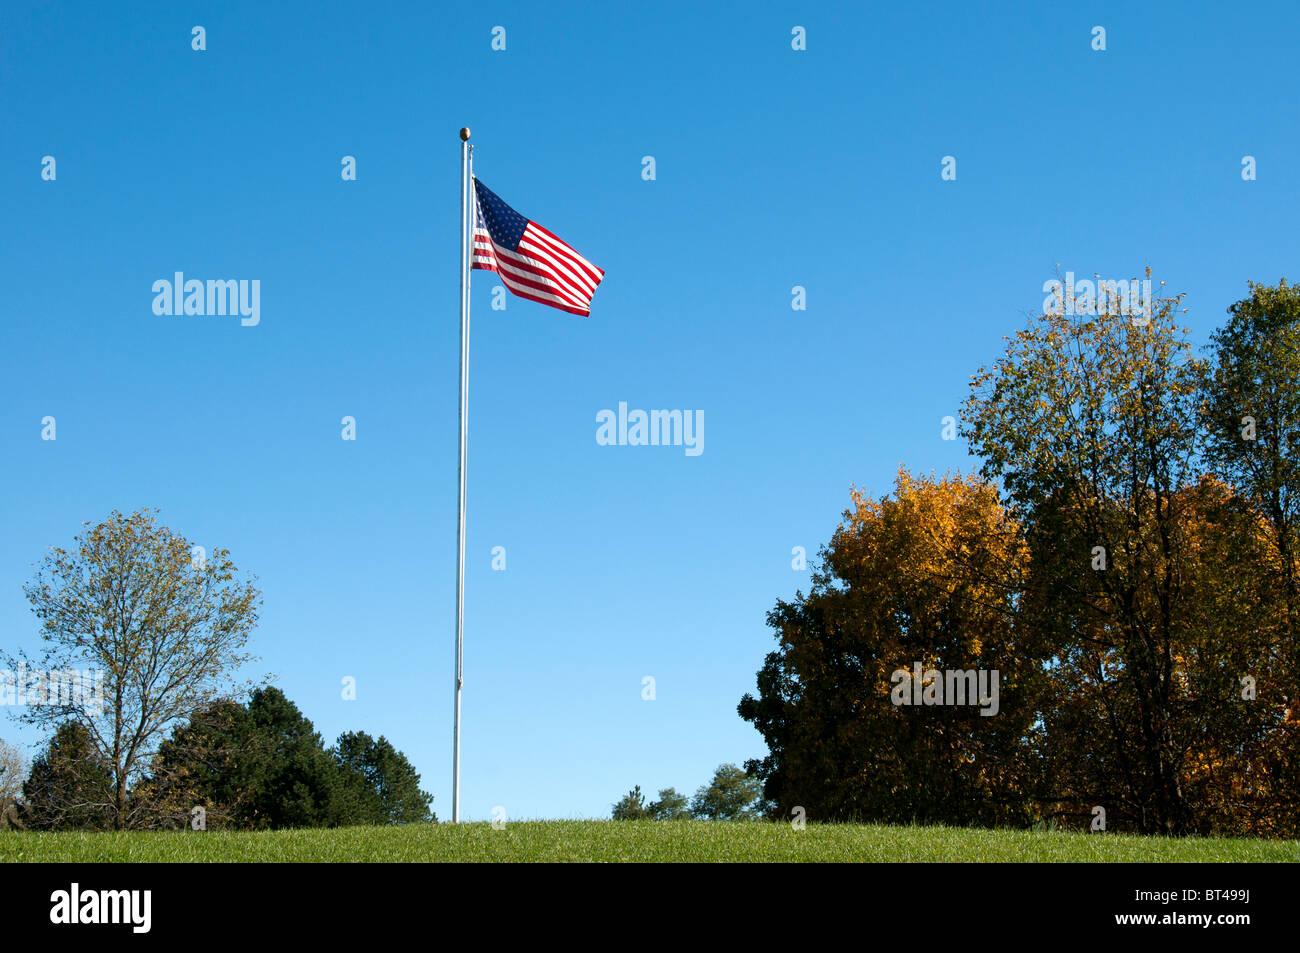 Flagpole on golf course. - Stock Image